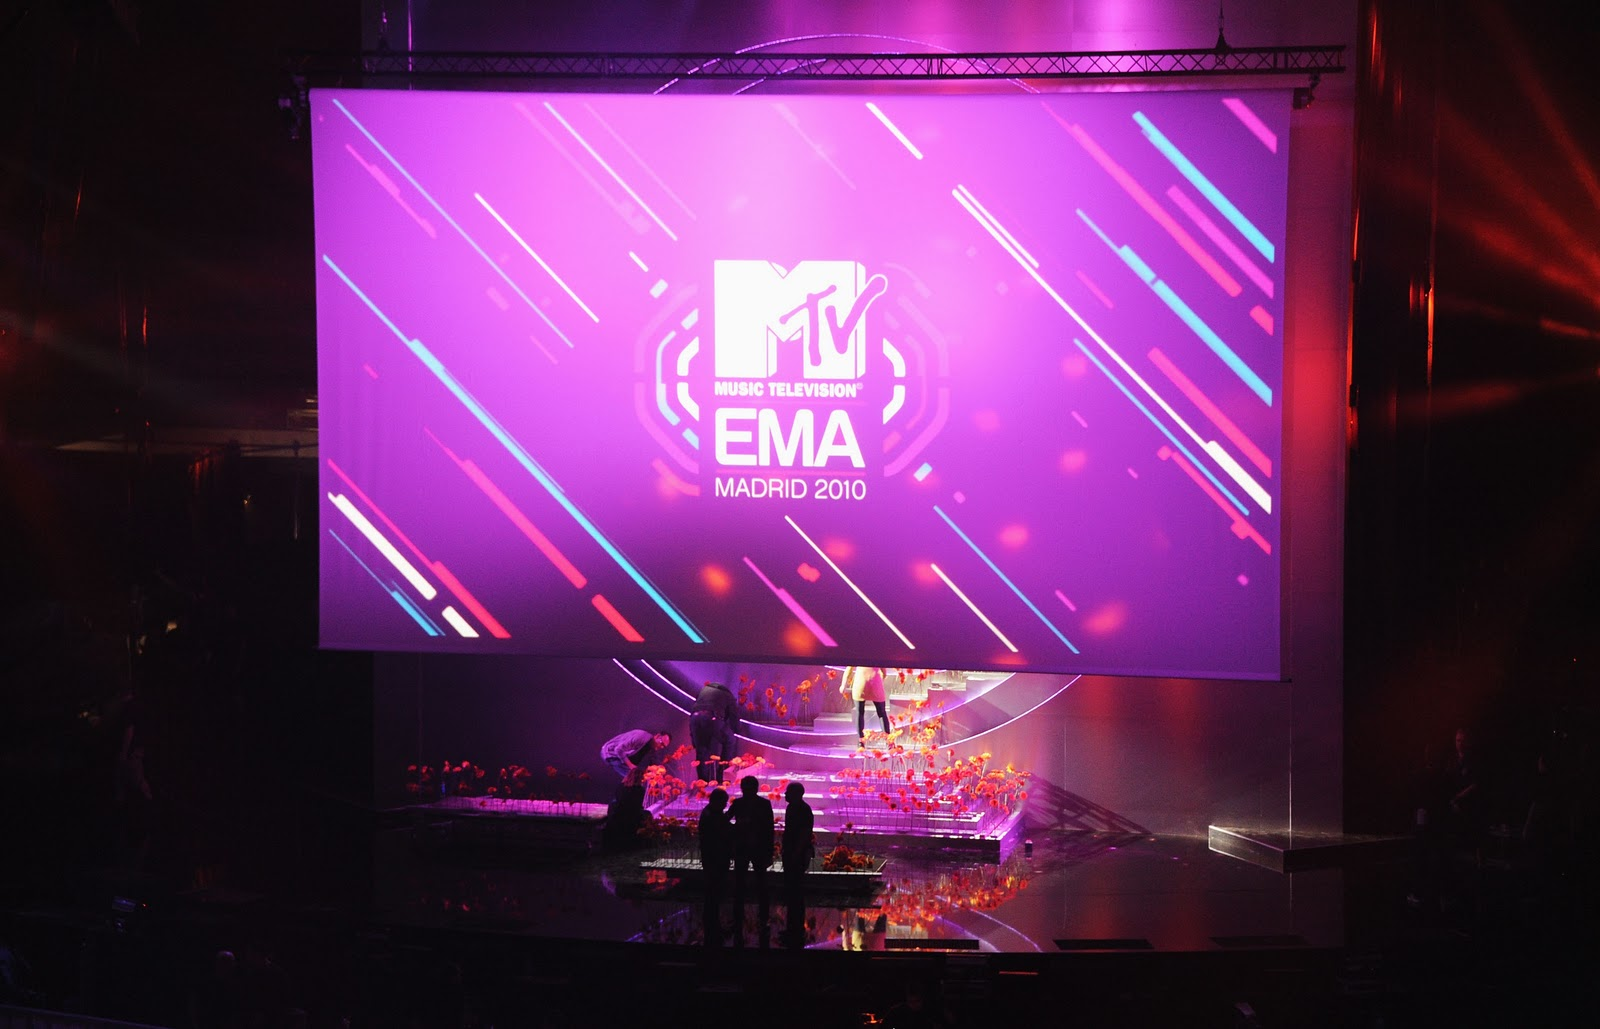 http://1.bp.blogspot.com/_gP0YbyEAqFY/TNcqIfZuFLI/AAAAAAAARu0/vvUGlNN9Xao/s1600/101010101ME015_MTV_Europe_M.JPG